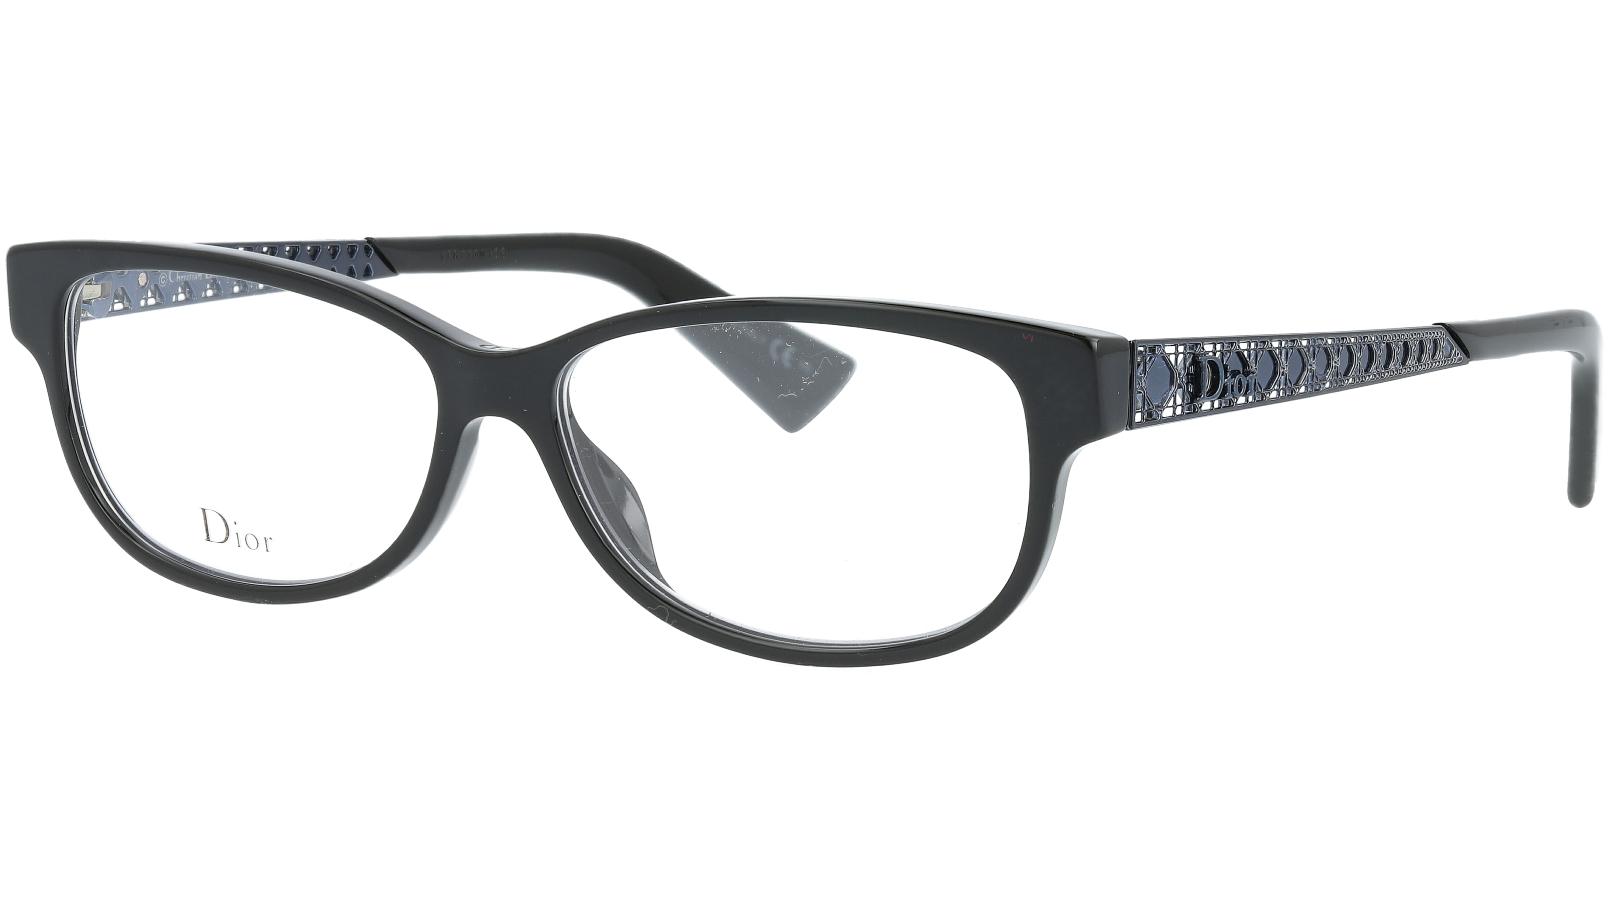 Dior AMAO5 807 53 Black Glasses